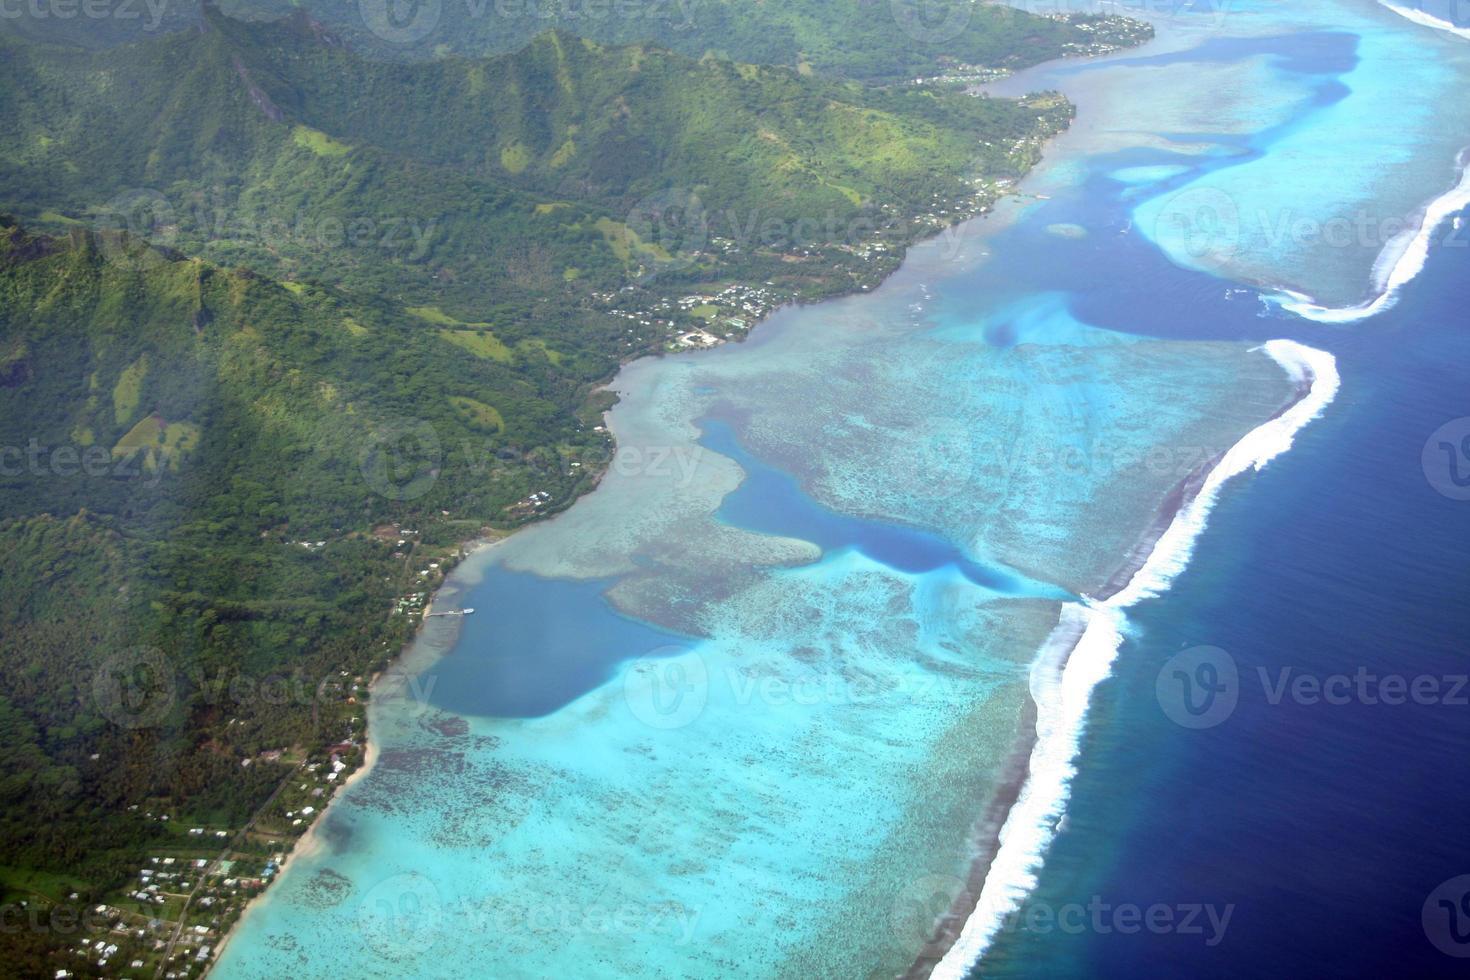 Pacific island lagoon photo